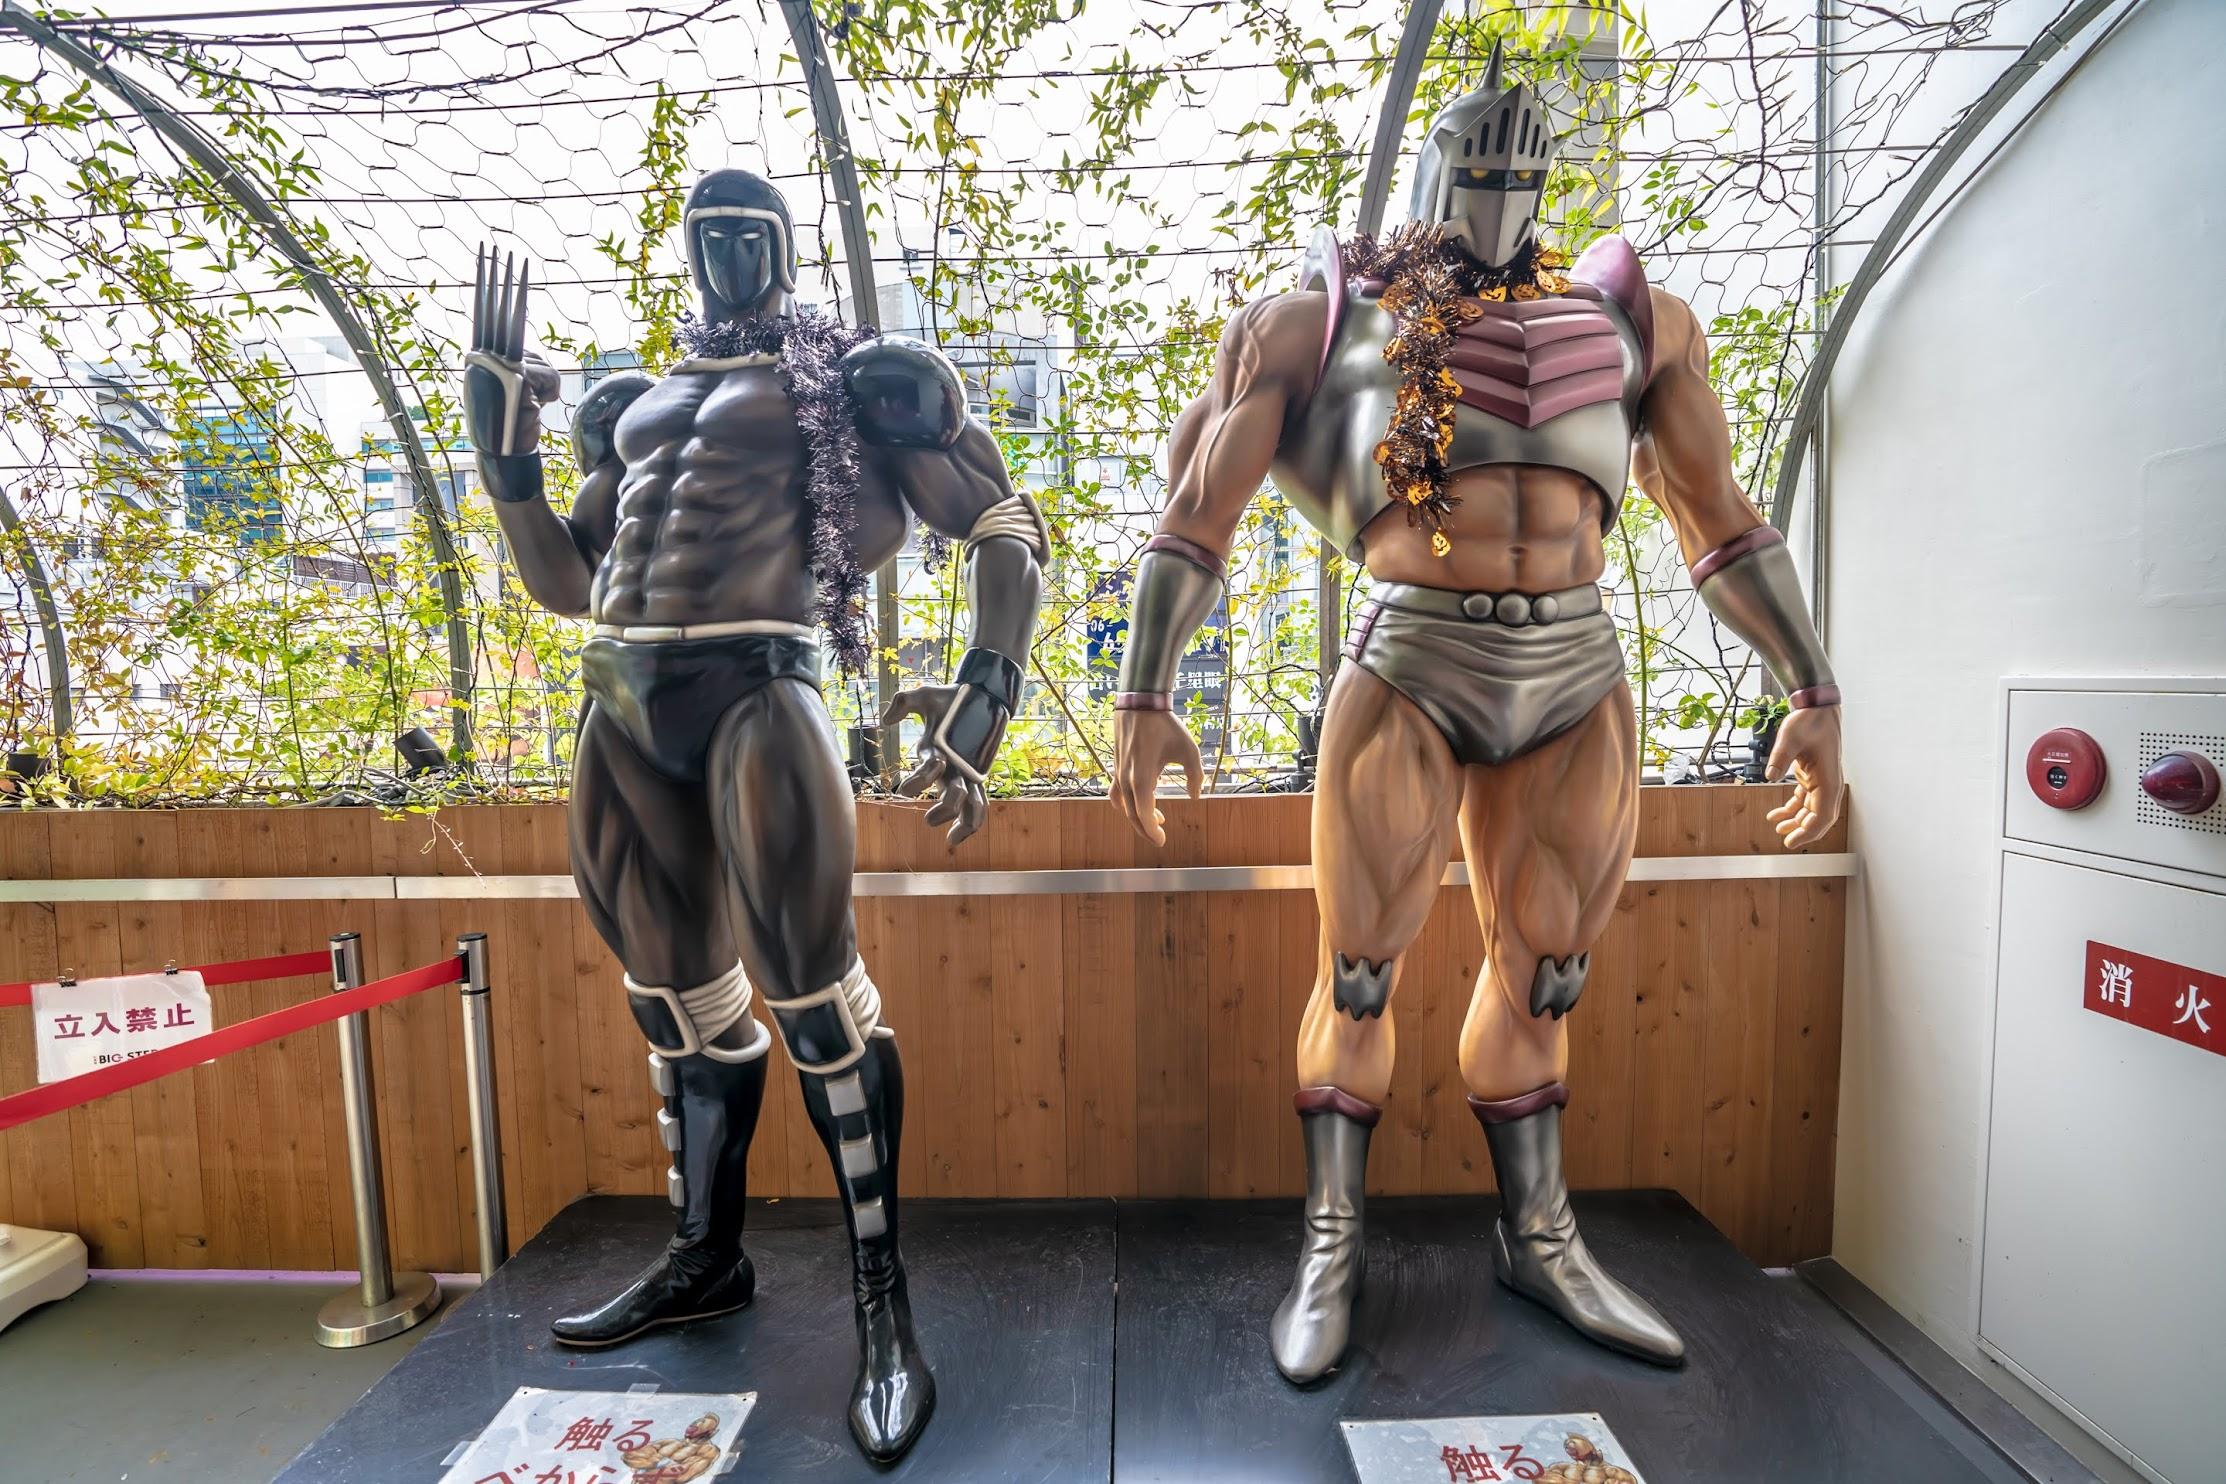 America-mura (American Village) Kinnikuman (Muscle Man)